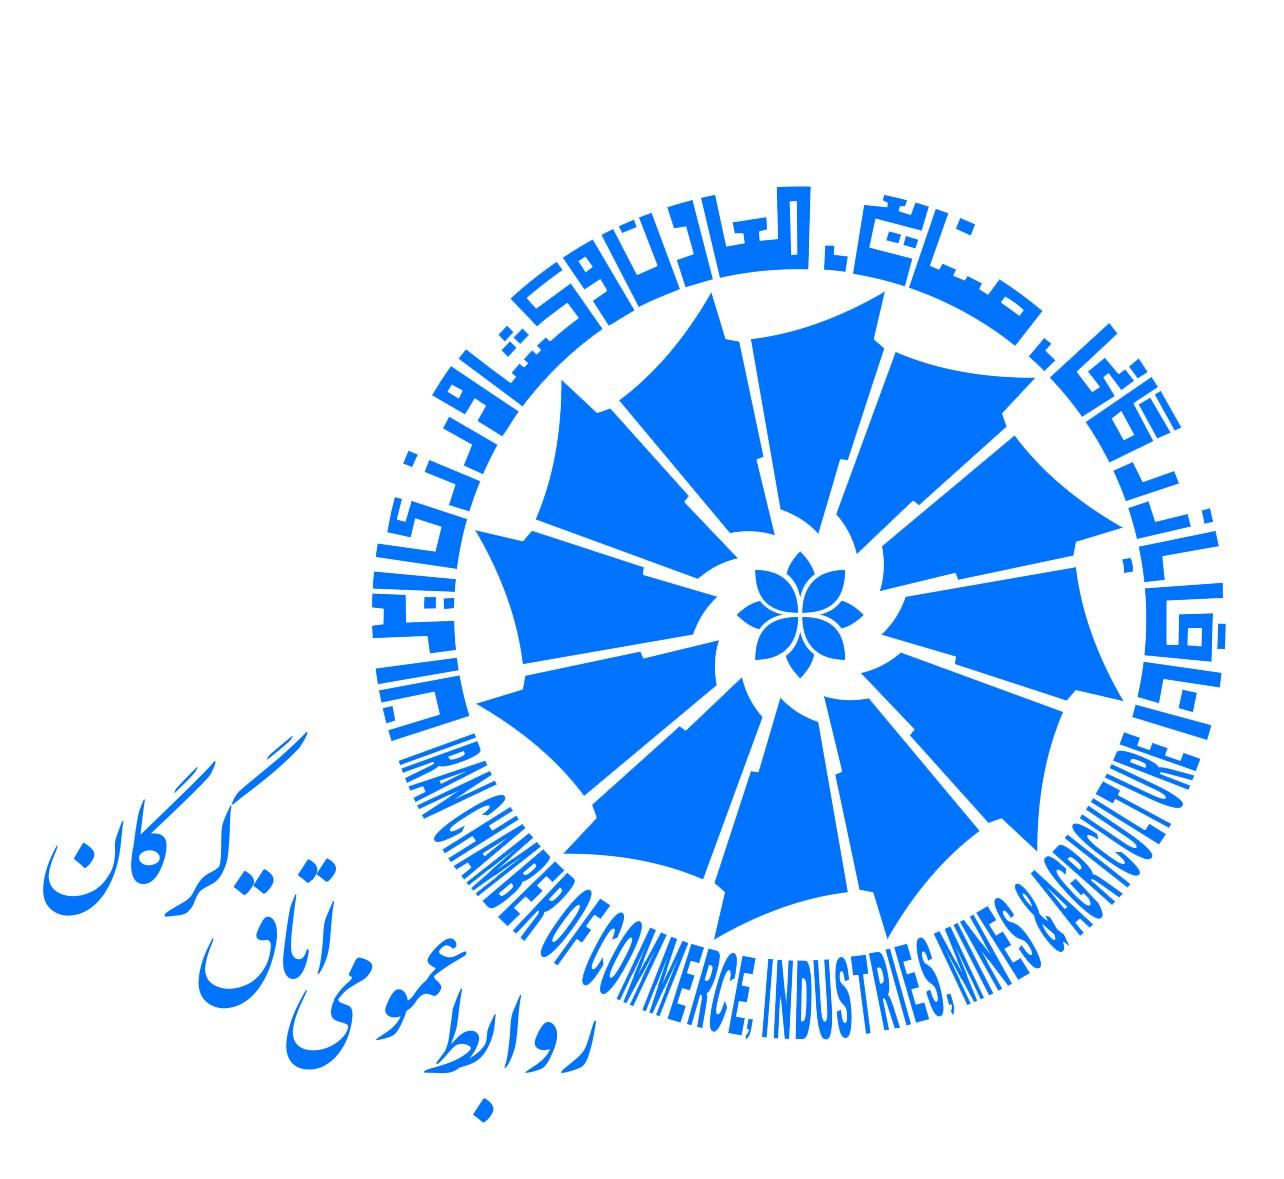 نمایشگاه صنعتی بین المللی قرقیزستان و اوراسیا - اکسپو 2020